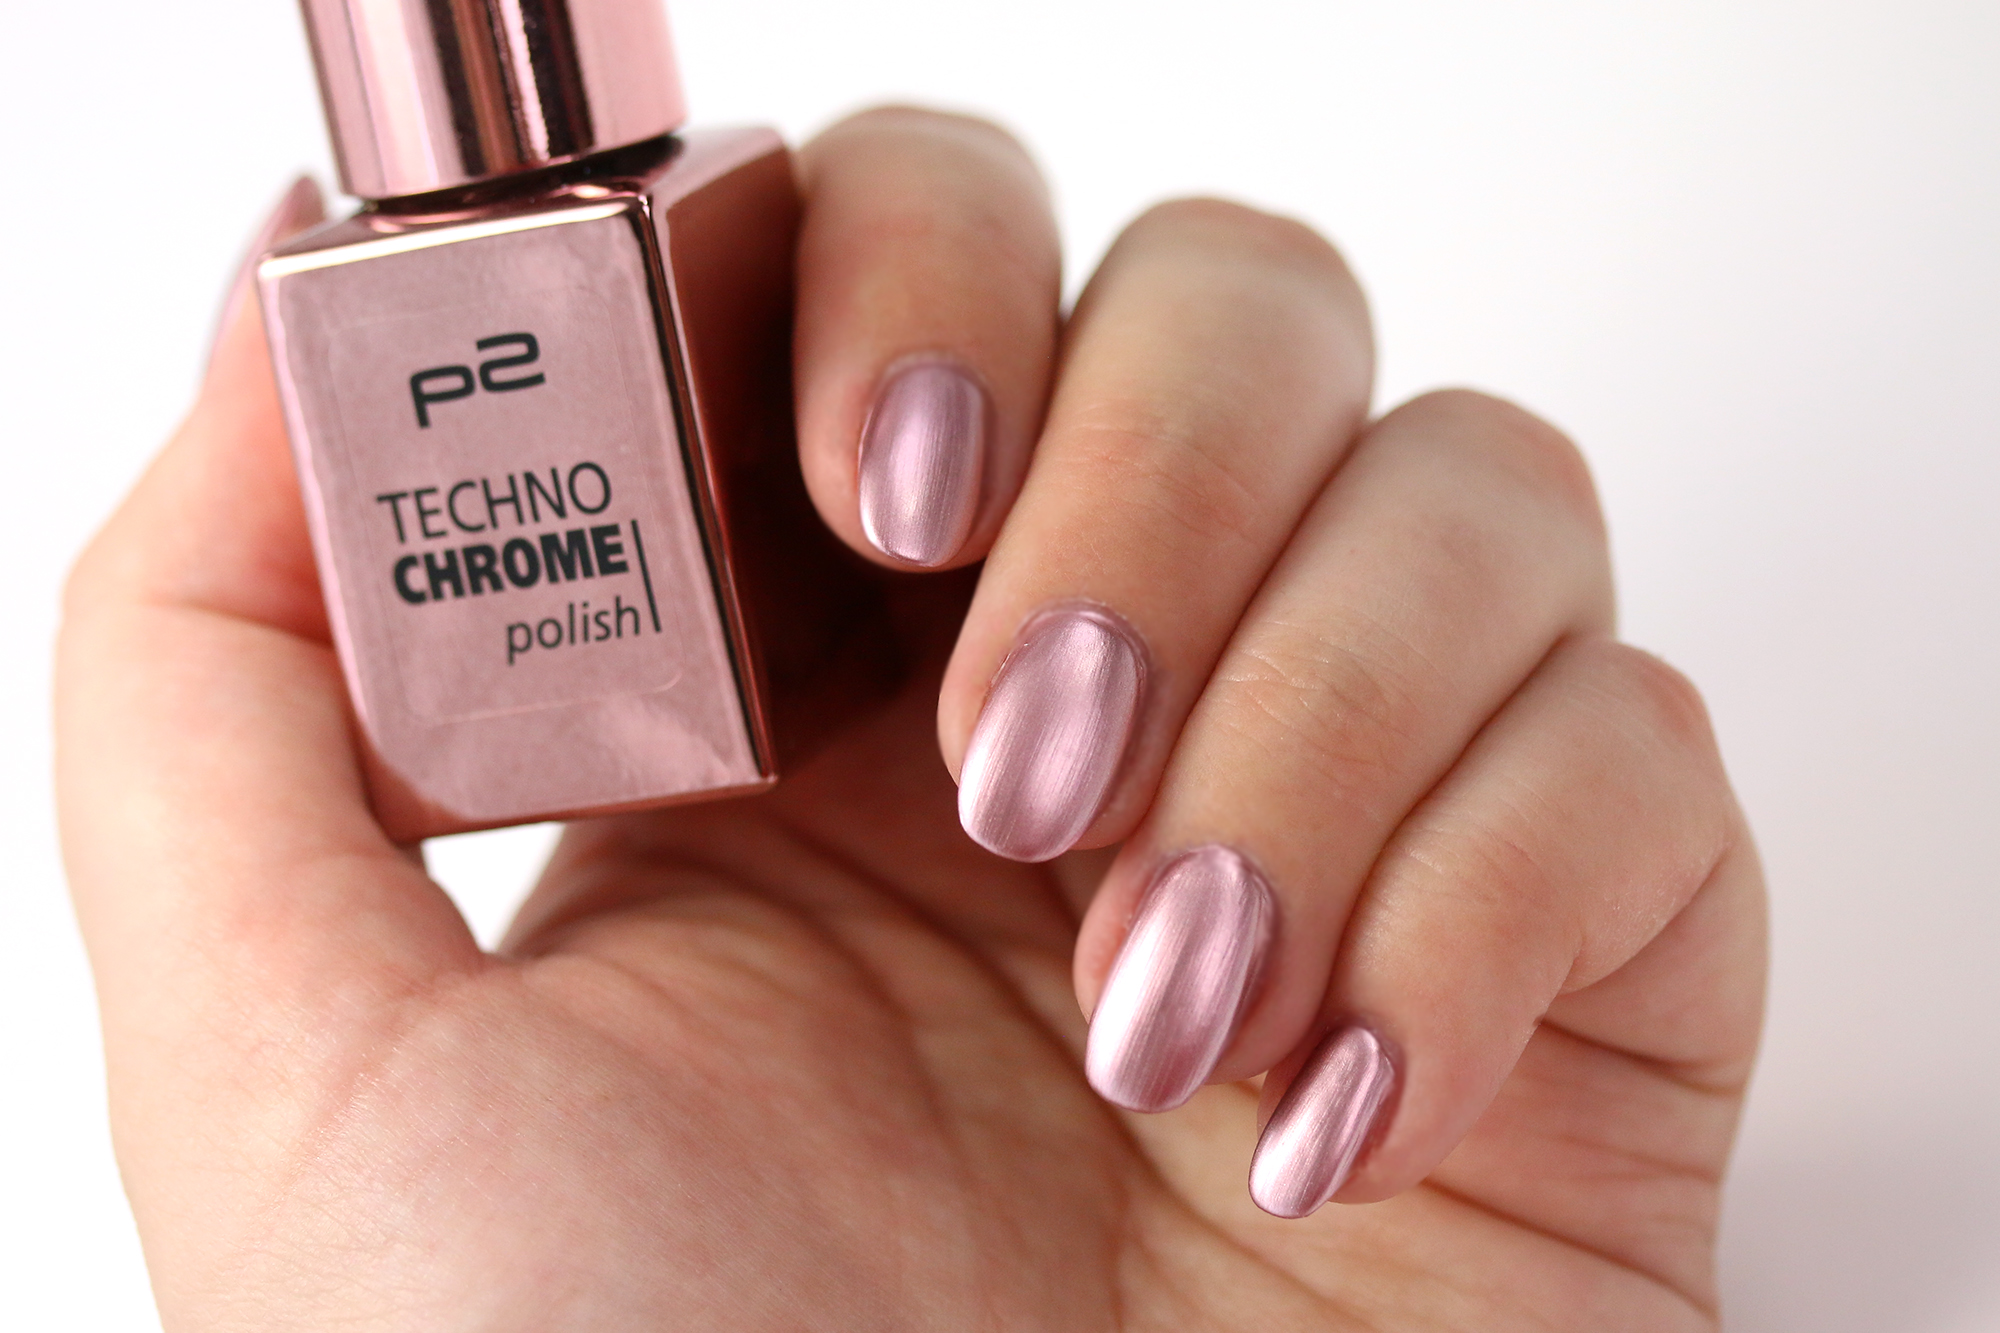 p2 Techno Chrome 030 Bronze Cut